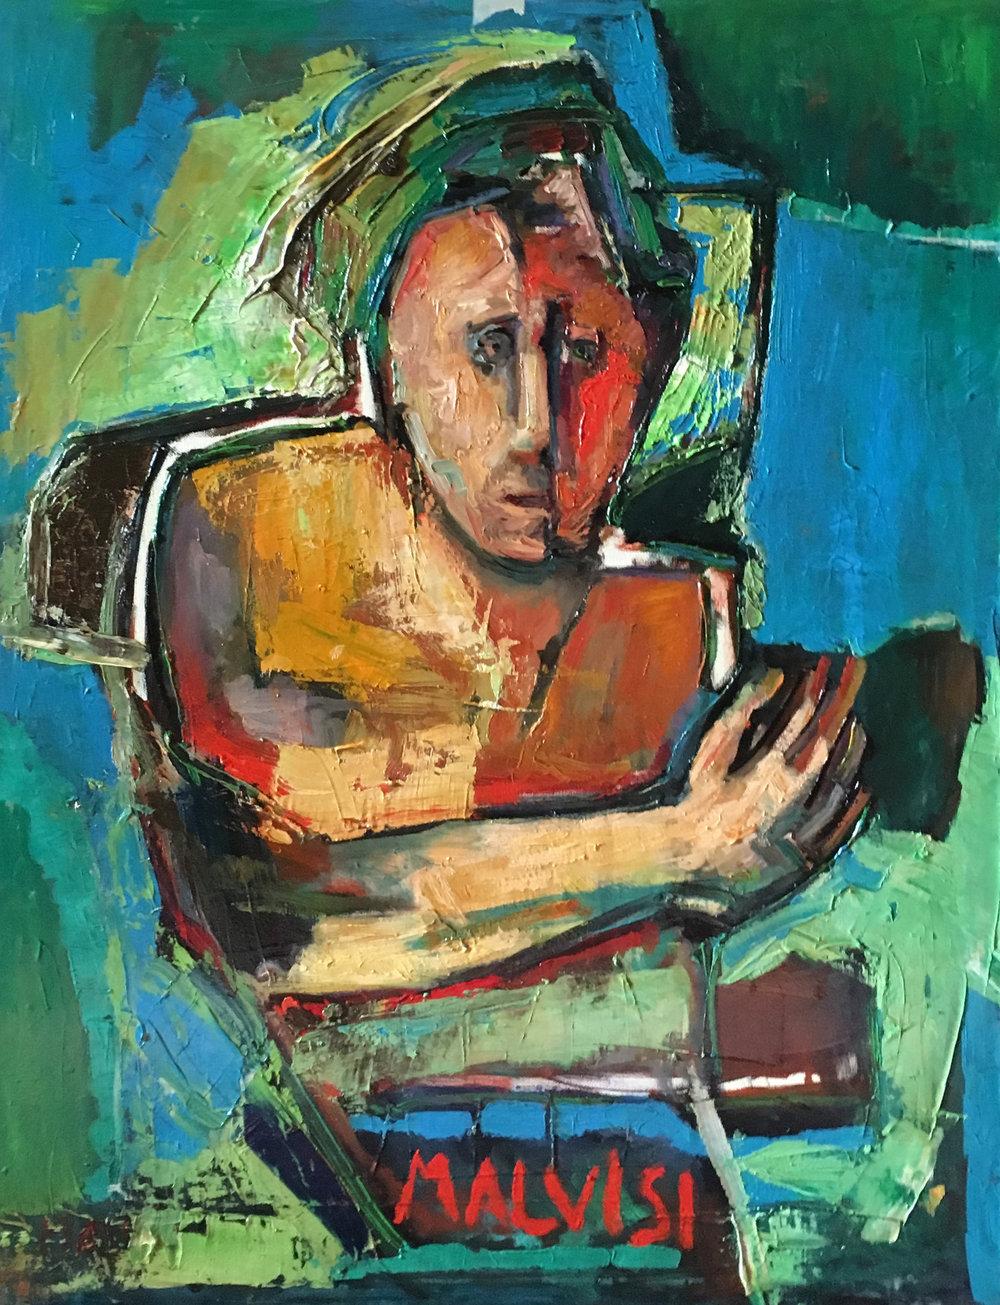 <b>The man!</b><br> (Orig.L'uomo!) <br> 1987 Oil on canvas <br> cm 60 x 80